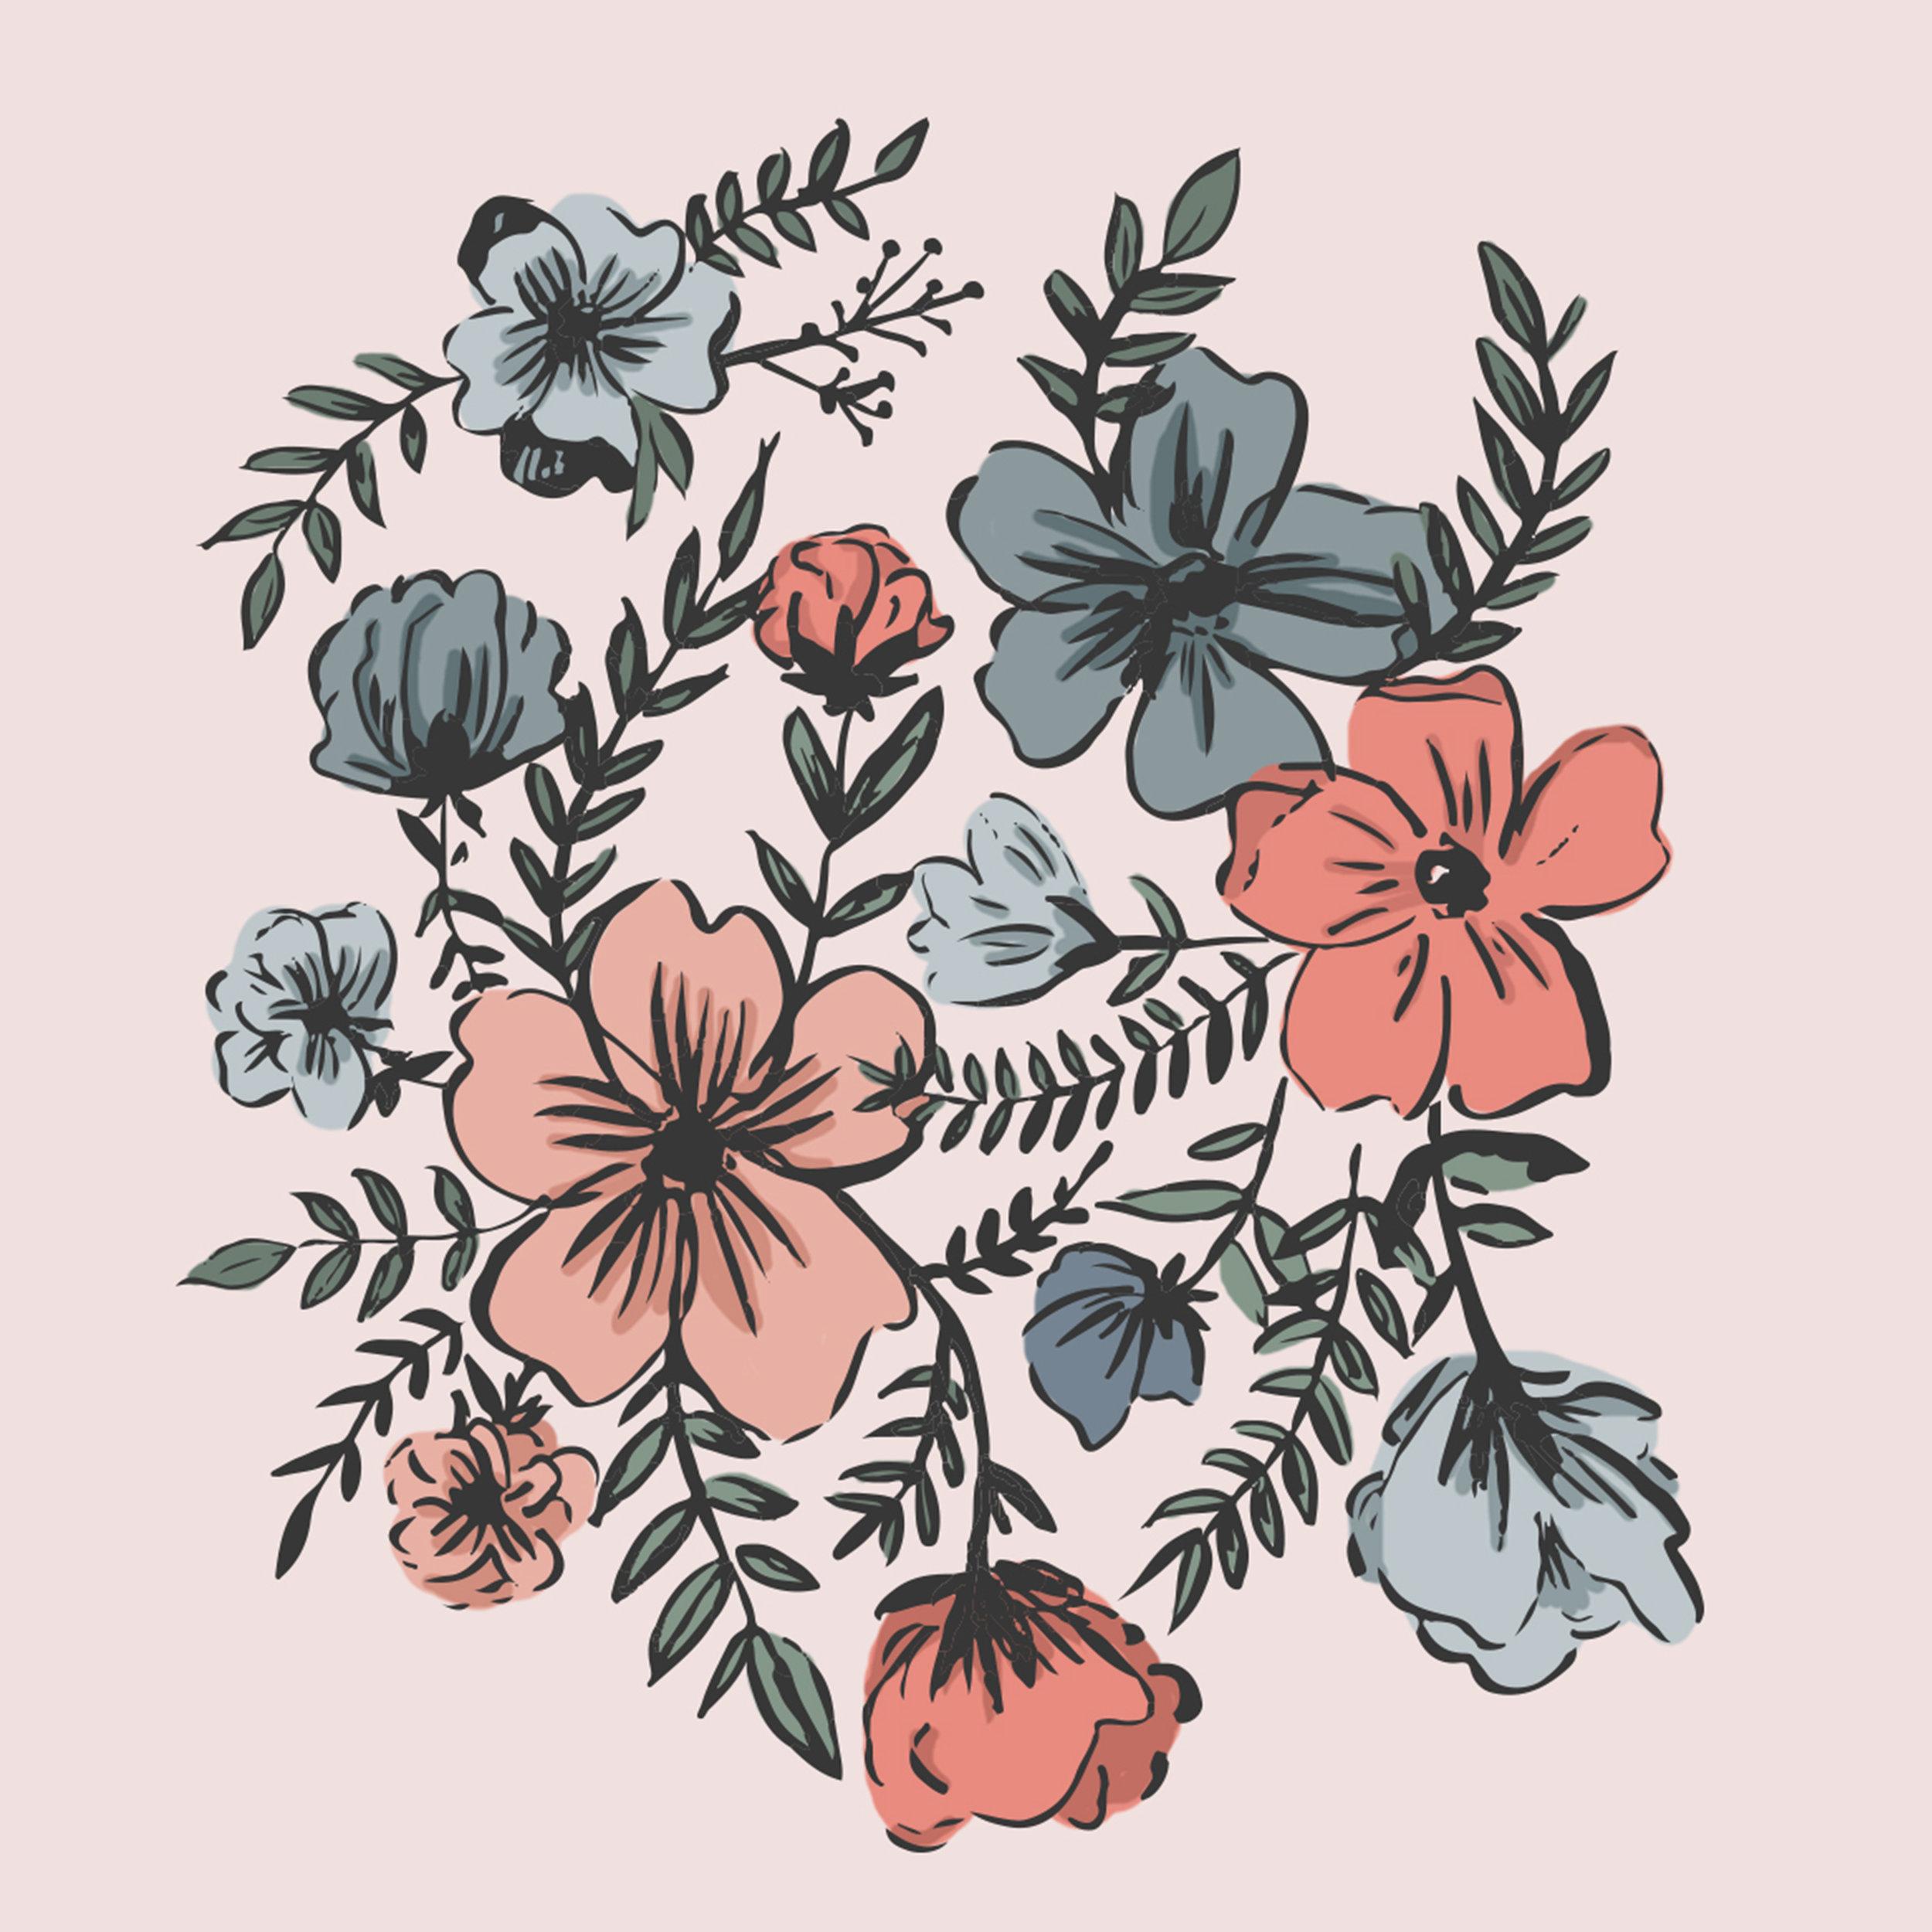 flowers-1-victoriabilsborough.jpg